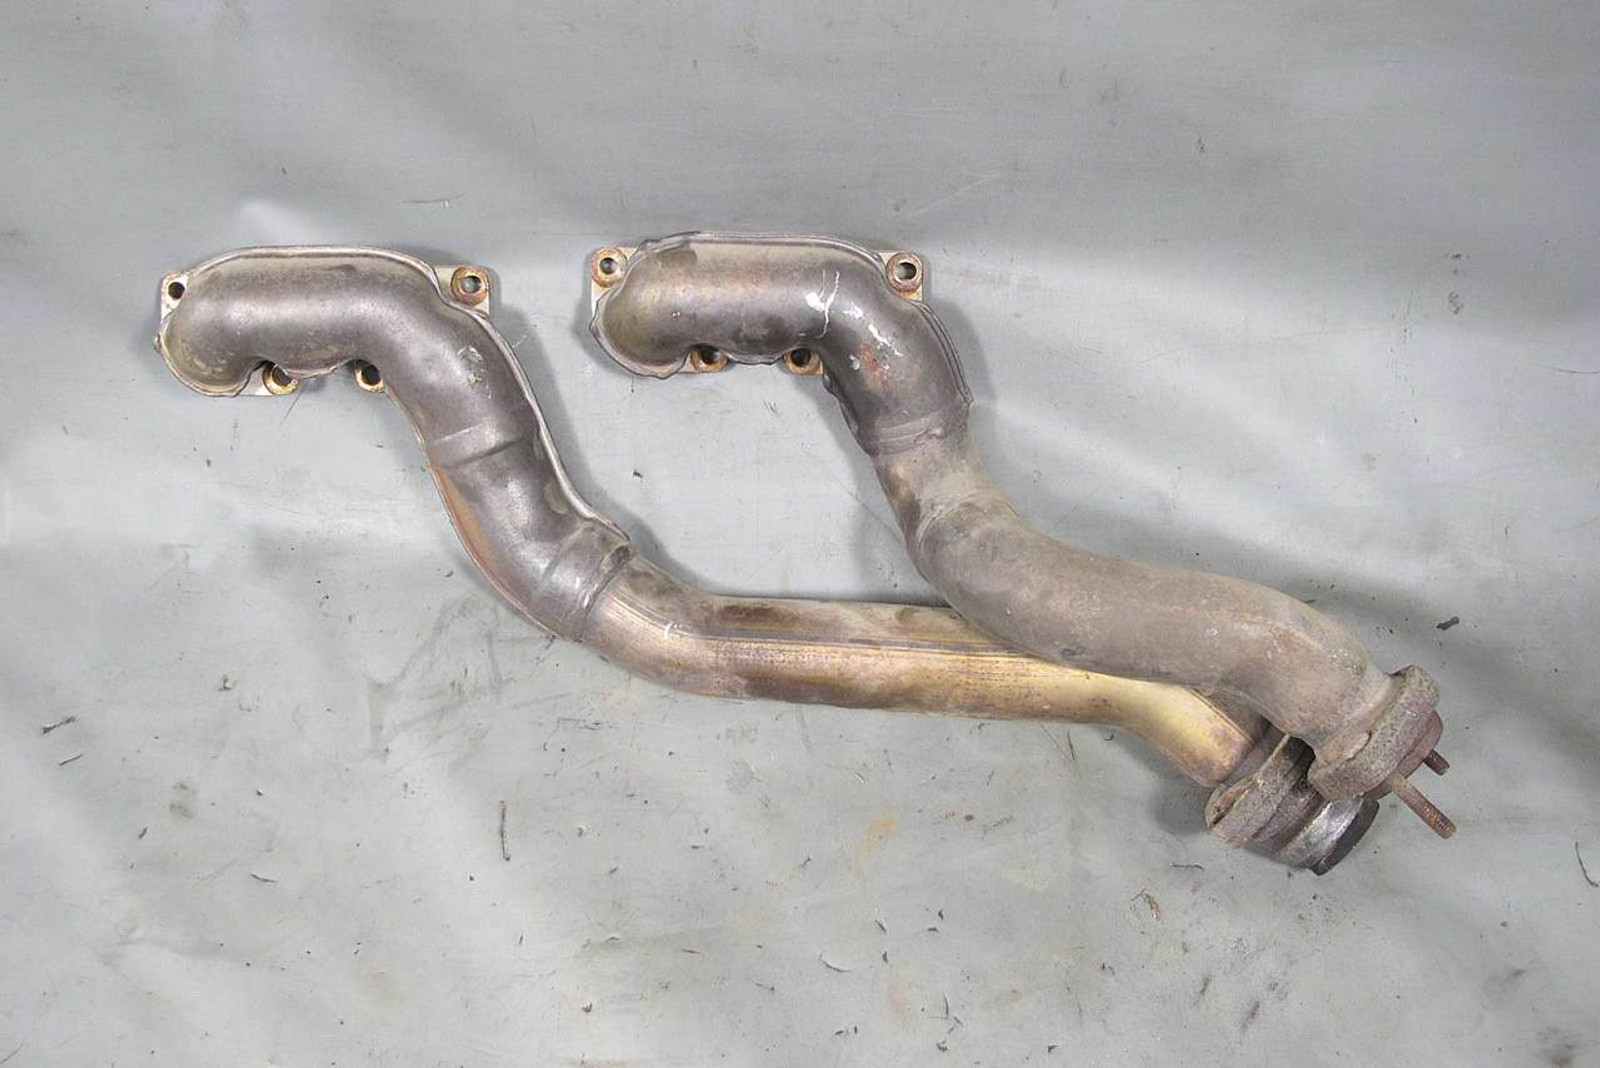 BMW M60 3 0L 4 0L V8 Bank 2 Factory Exhaust Manifold Pair Tubular 1994-1997  USED